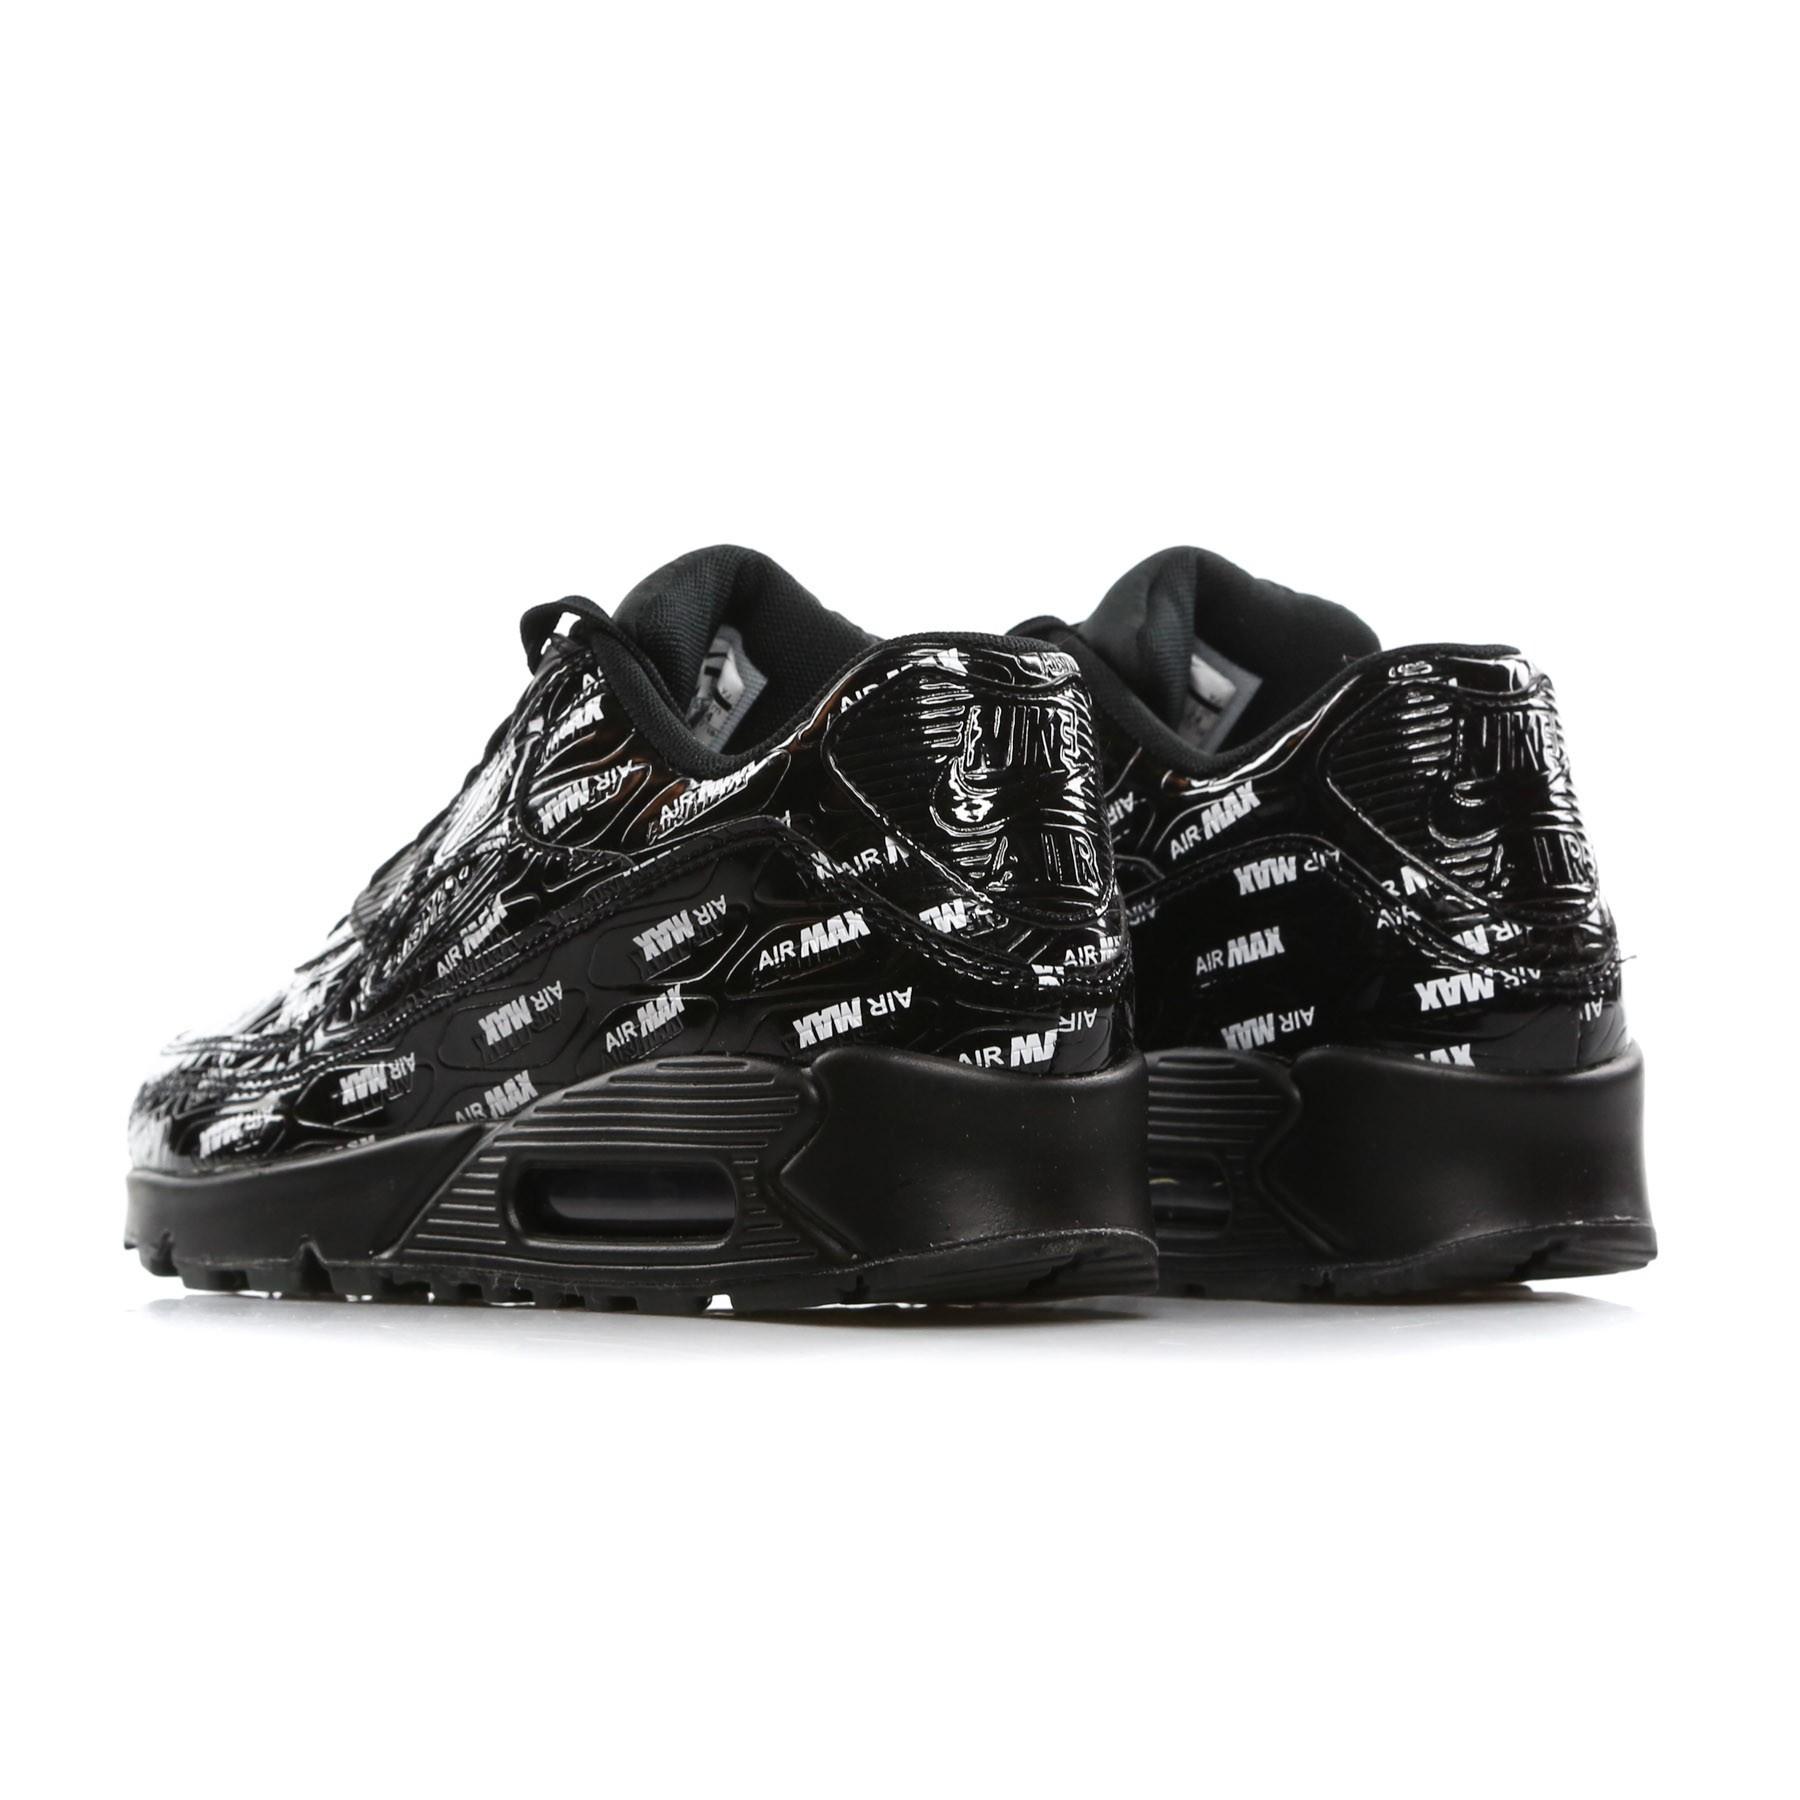 Mens Nike Air Max 90 Premium BlackBlackWhite 700155 008 Various UK Sizes